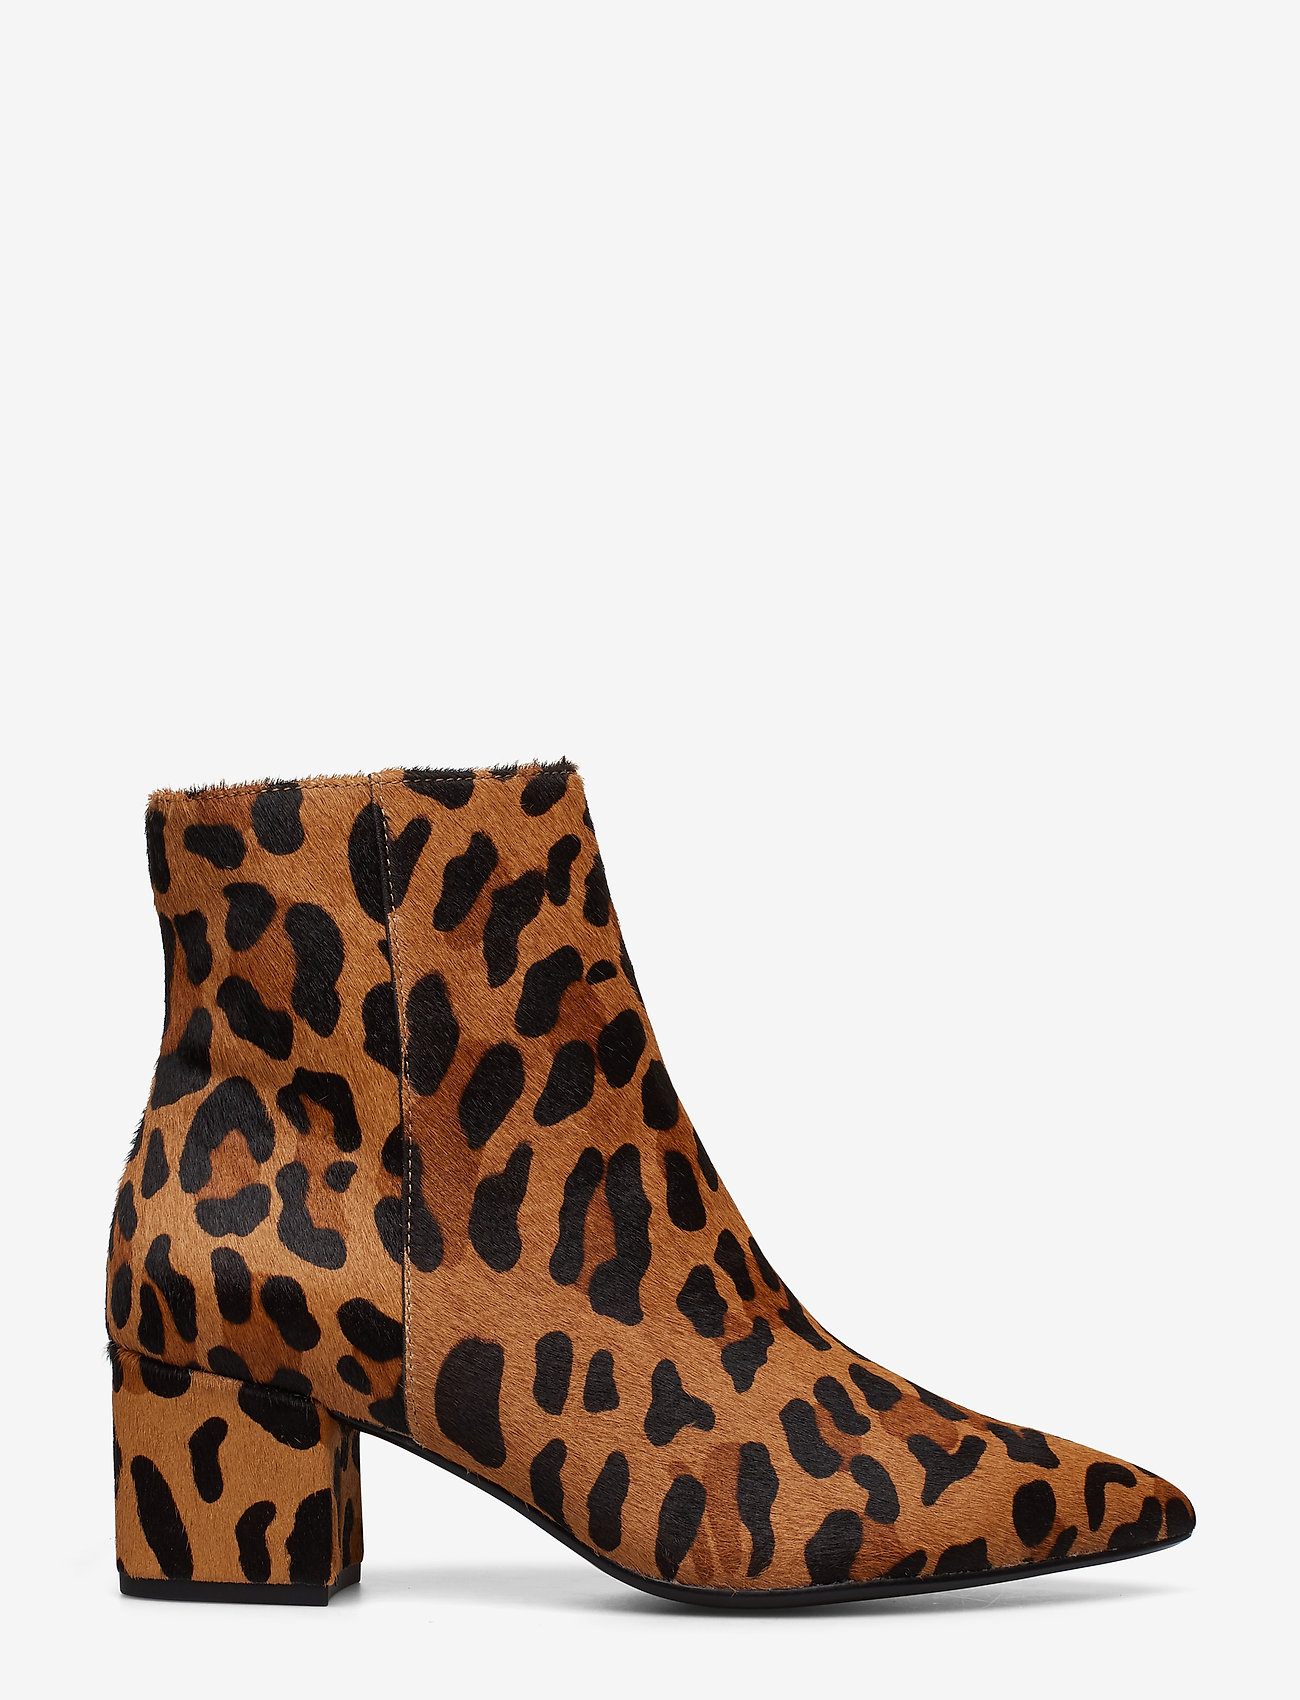 Omarii (Dark_leopard-print_leather) - Dune London oXRfI9